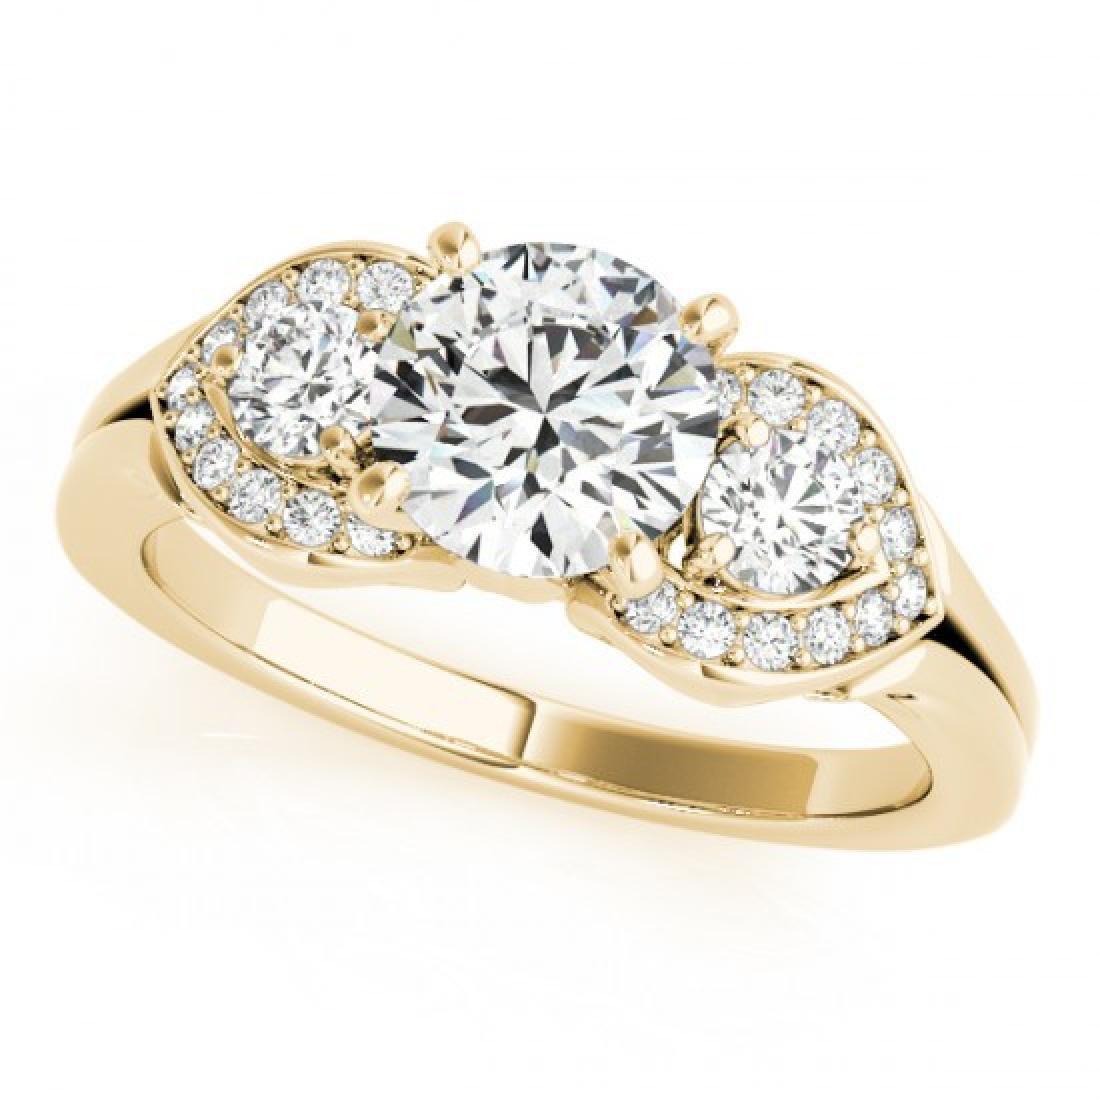 1.2 CTW Certified VS/SI Diamond 3 Stone Ring 14K Yellow